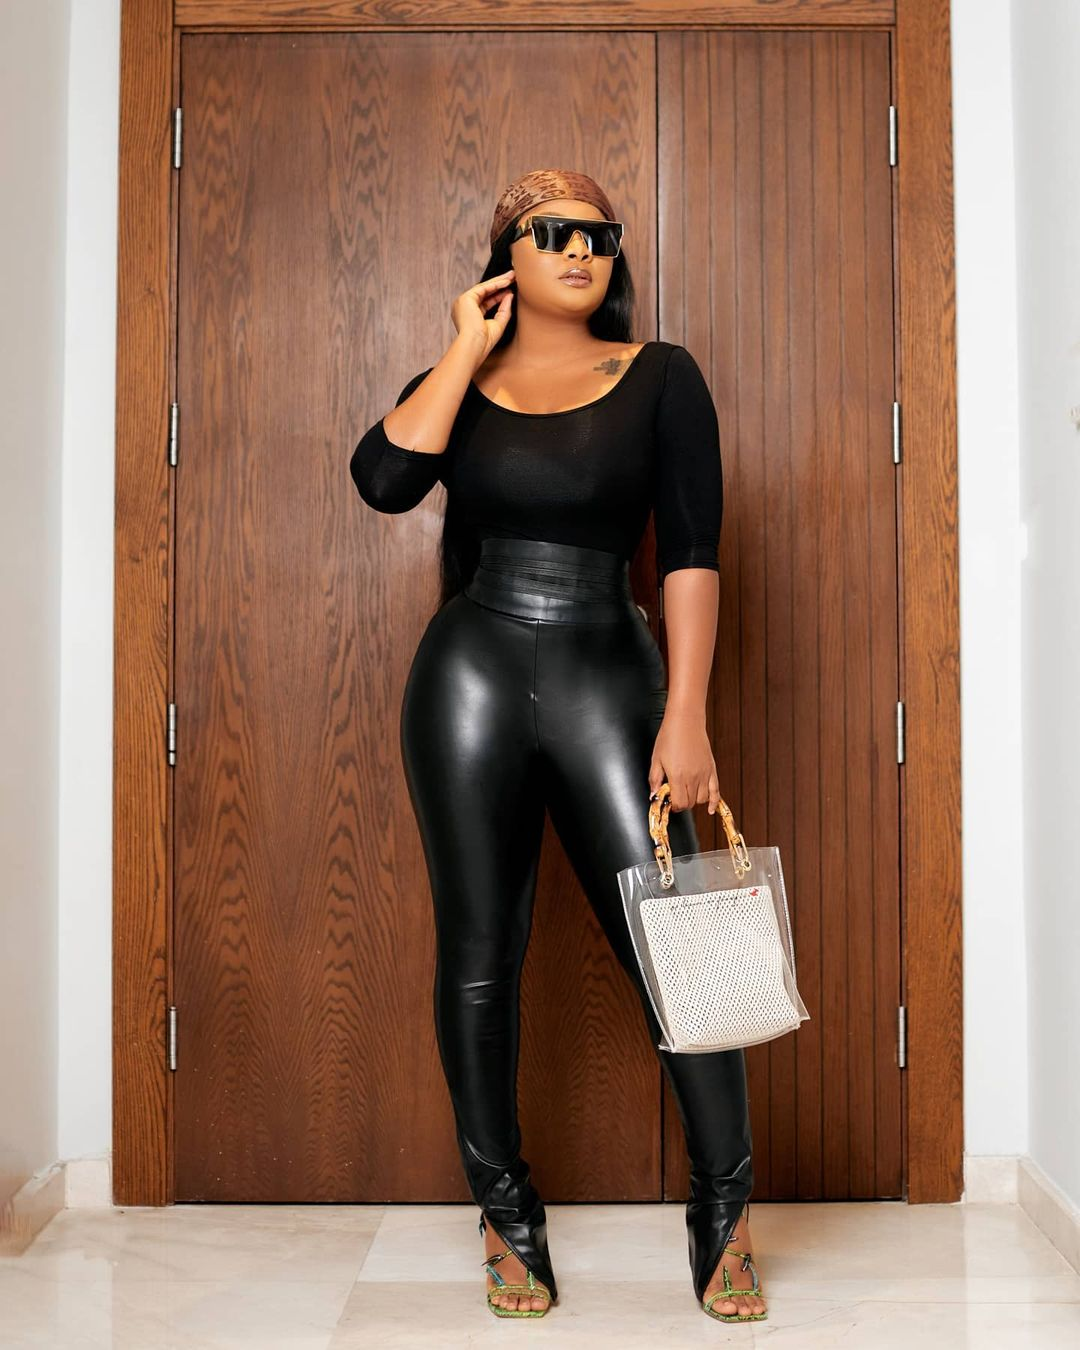 Bimbo Ademoye Keeps It Less Dramatic In Black